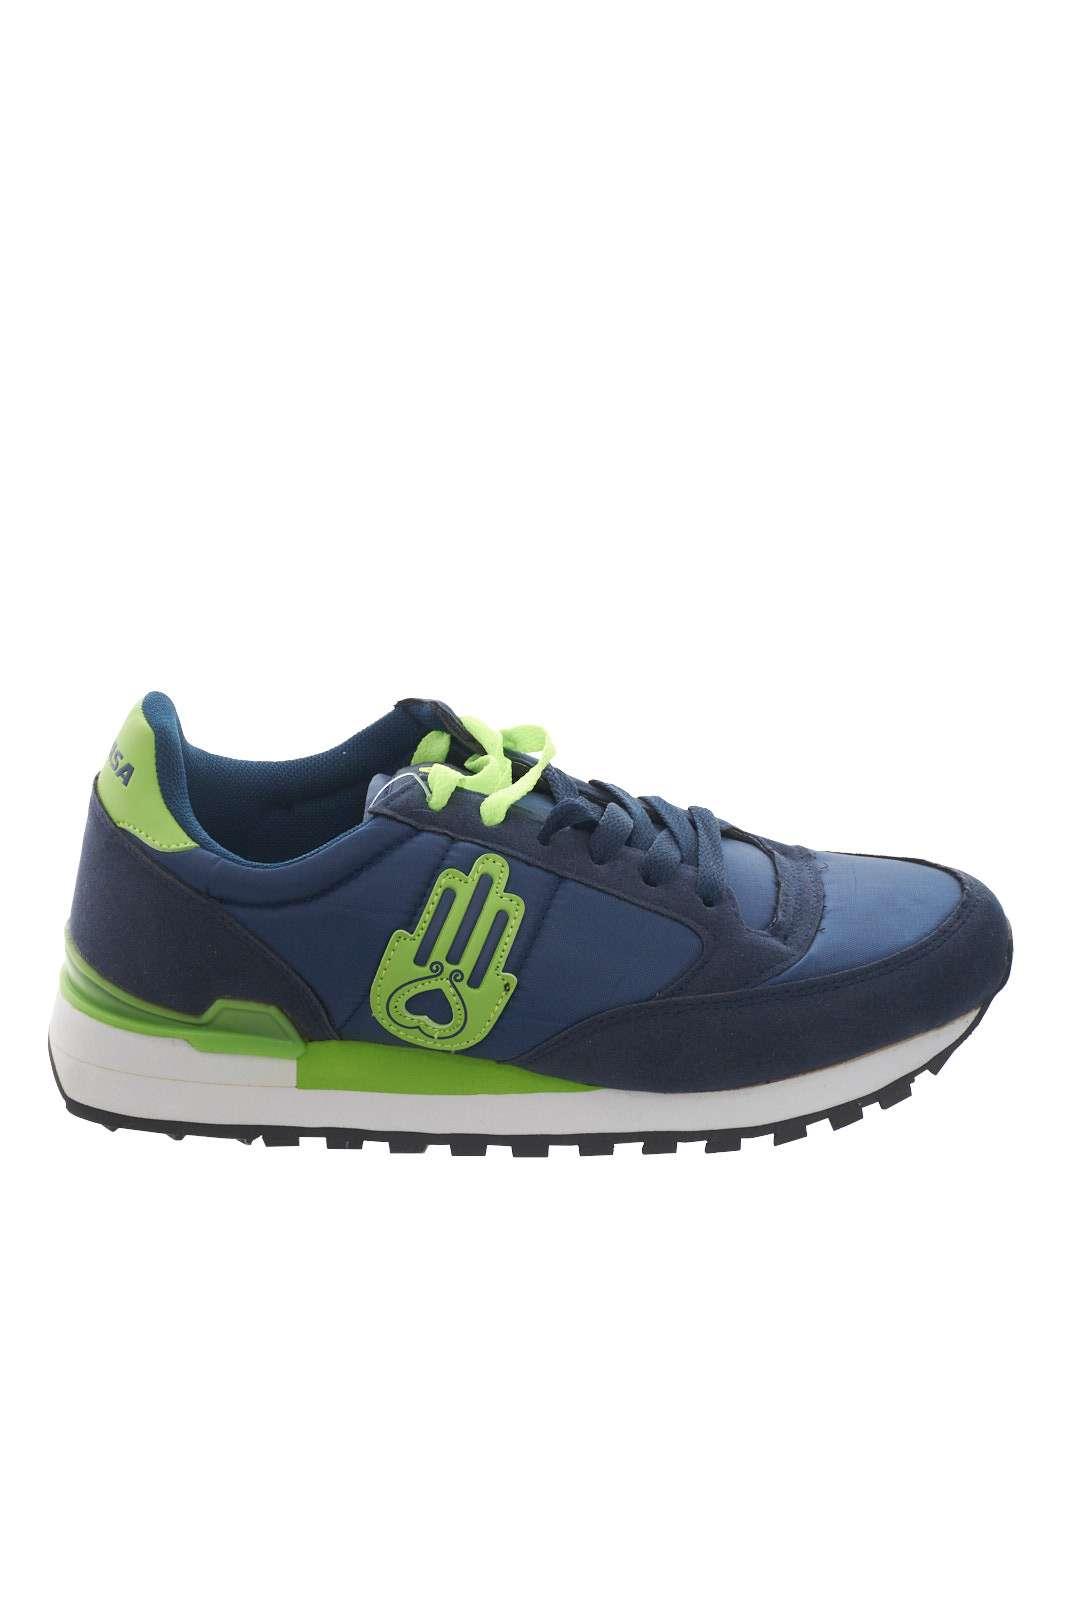 https://www.parmax.com/media/catalog/product/a/i/PE-outlet_parmax-sneaker-donna-Kamsa-KAMSA2020-A.jpg